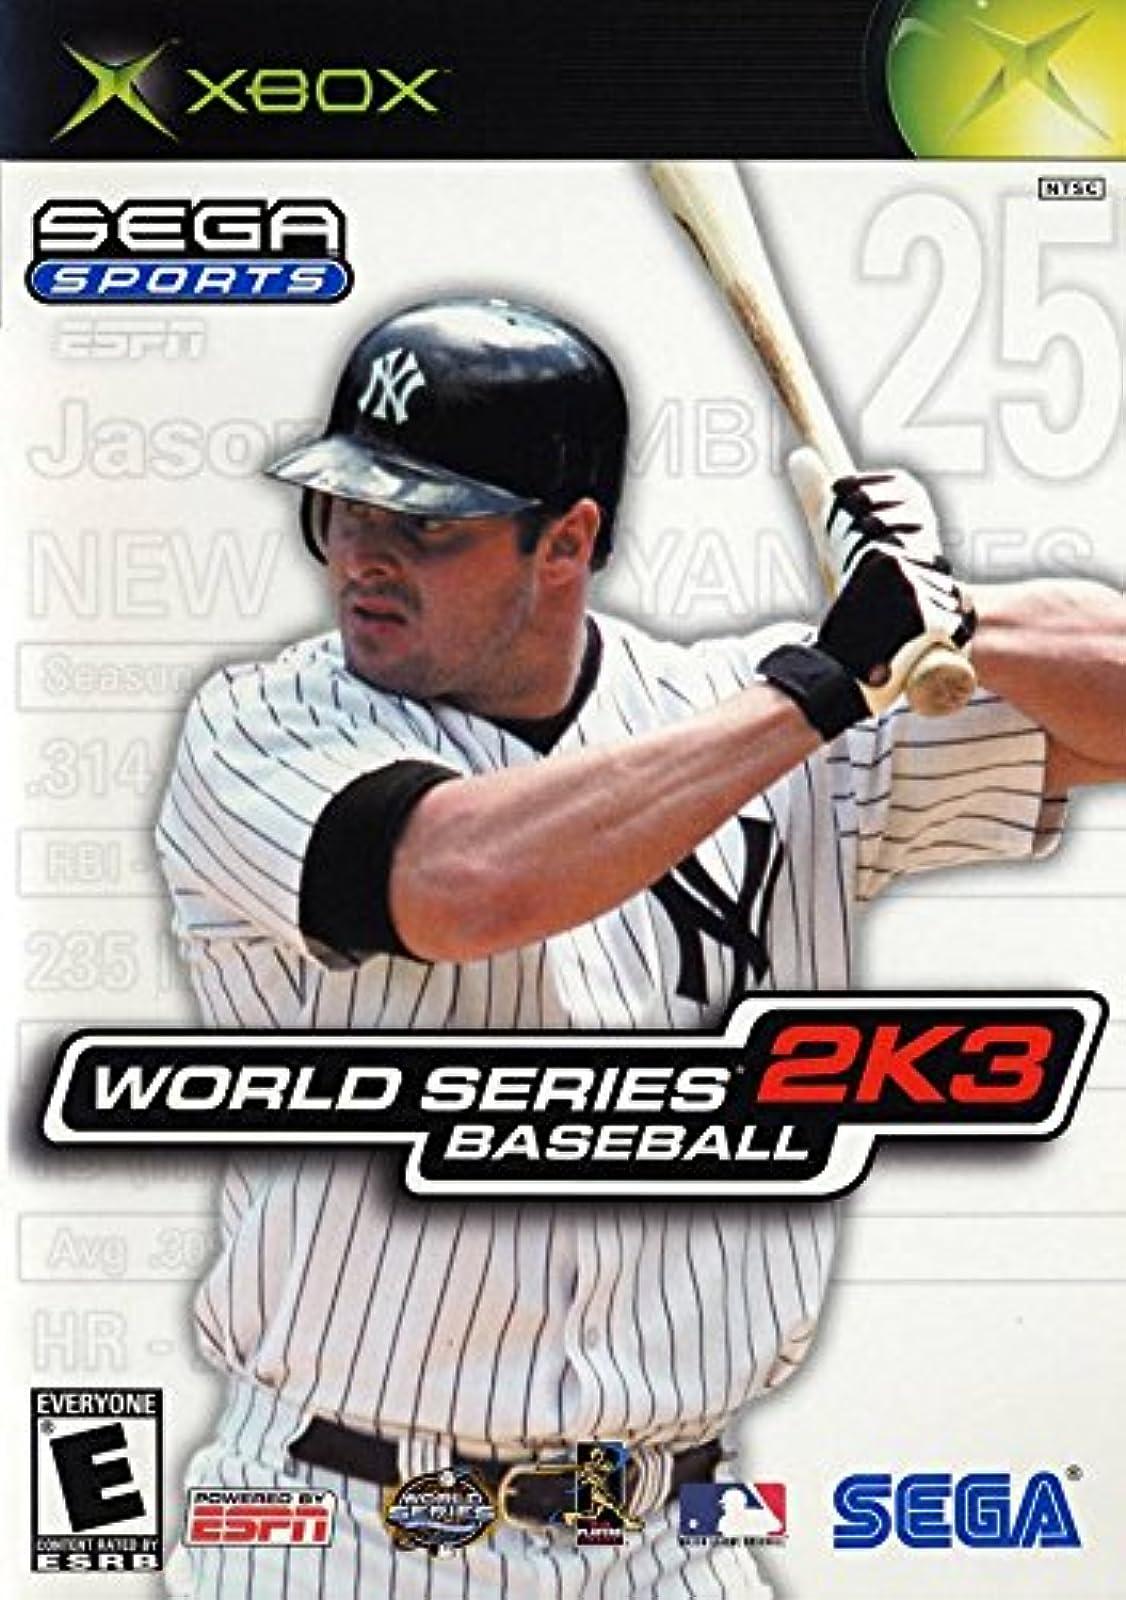 Sega Sports: World Series Baseball 2K3 Xbox For Xbox Original